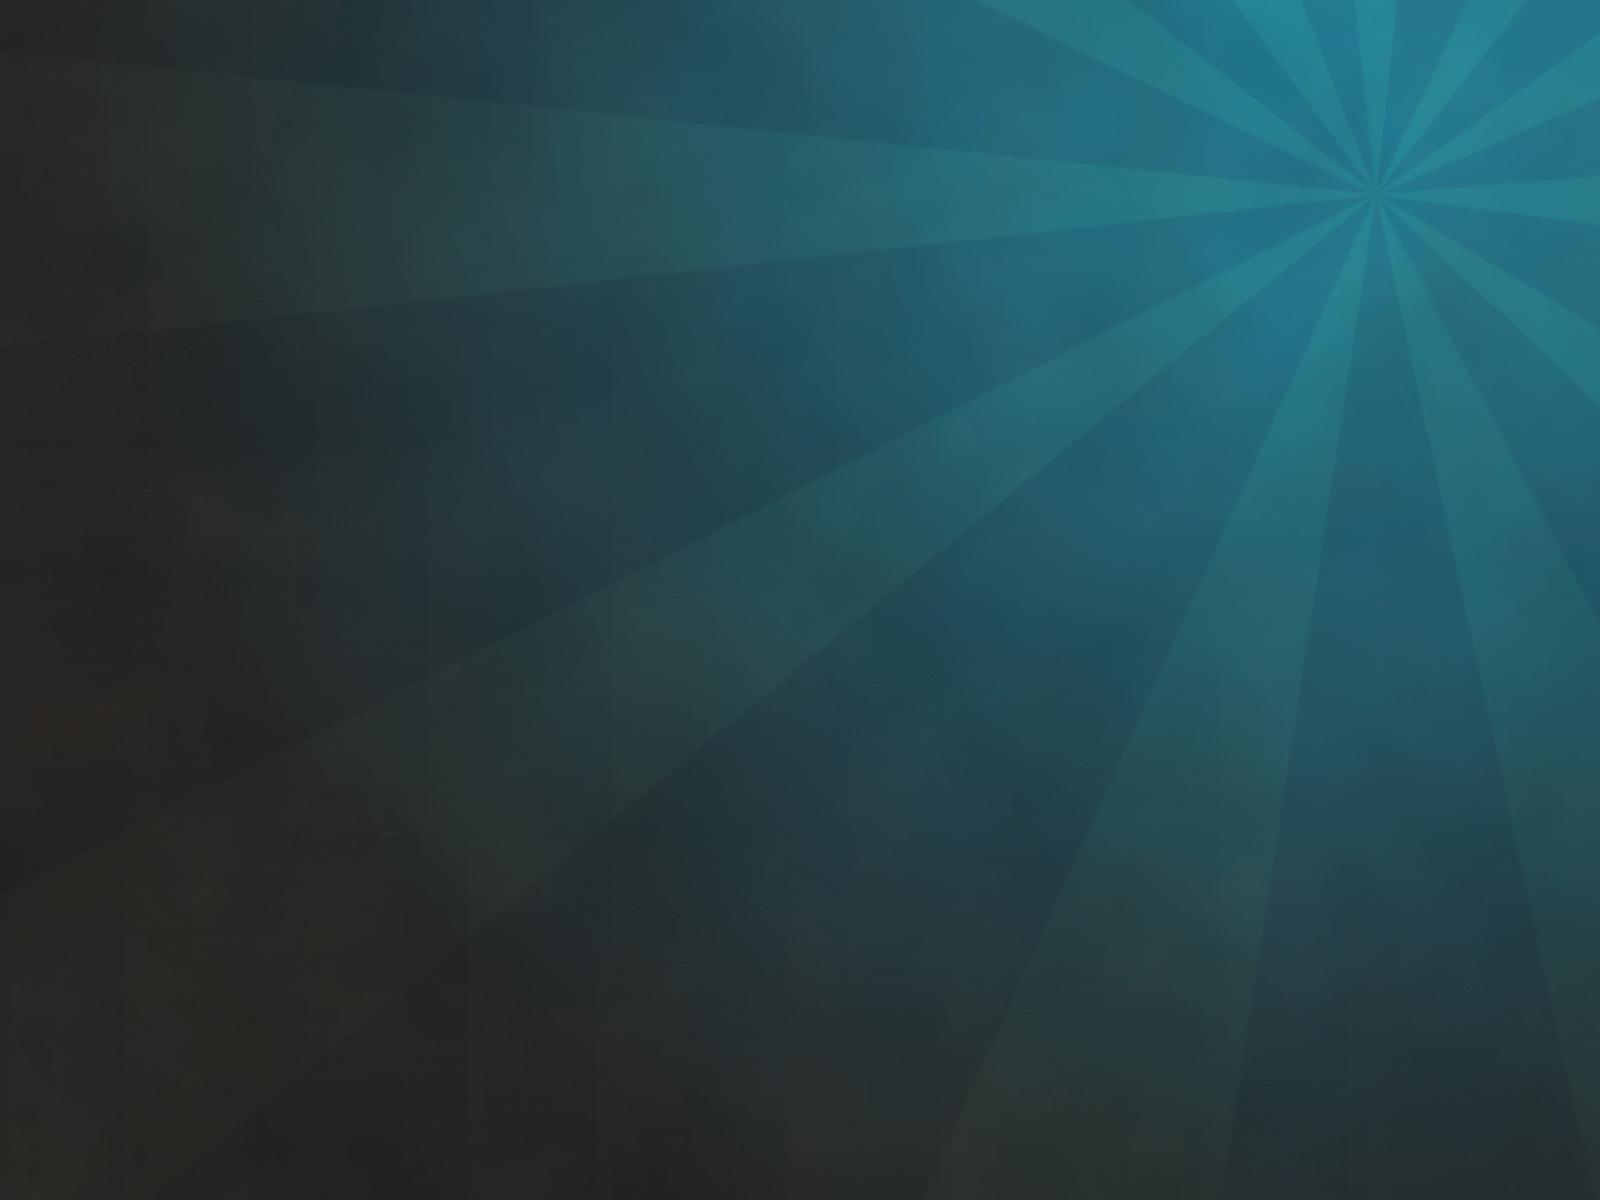 Creative Website Backgrounds Download HD Wallpapers 1600x1200